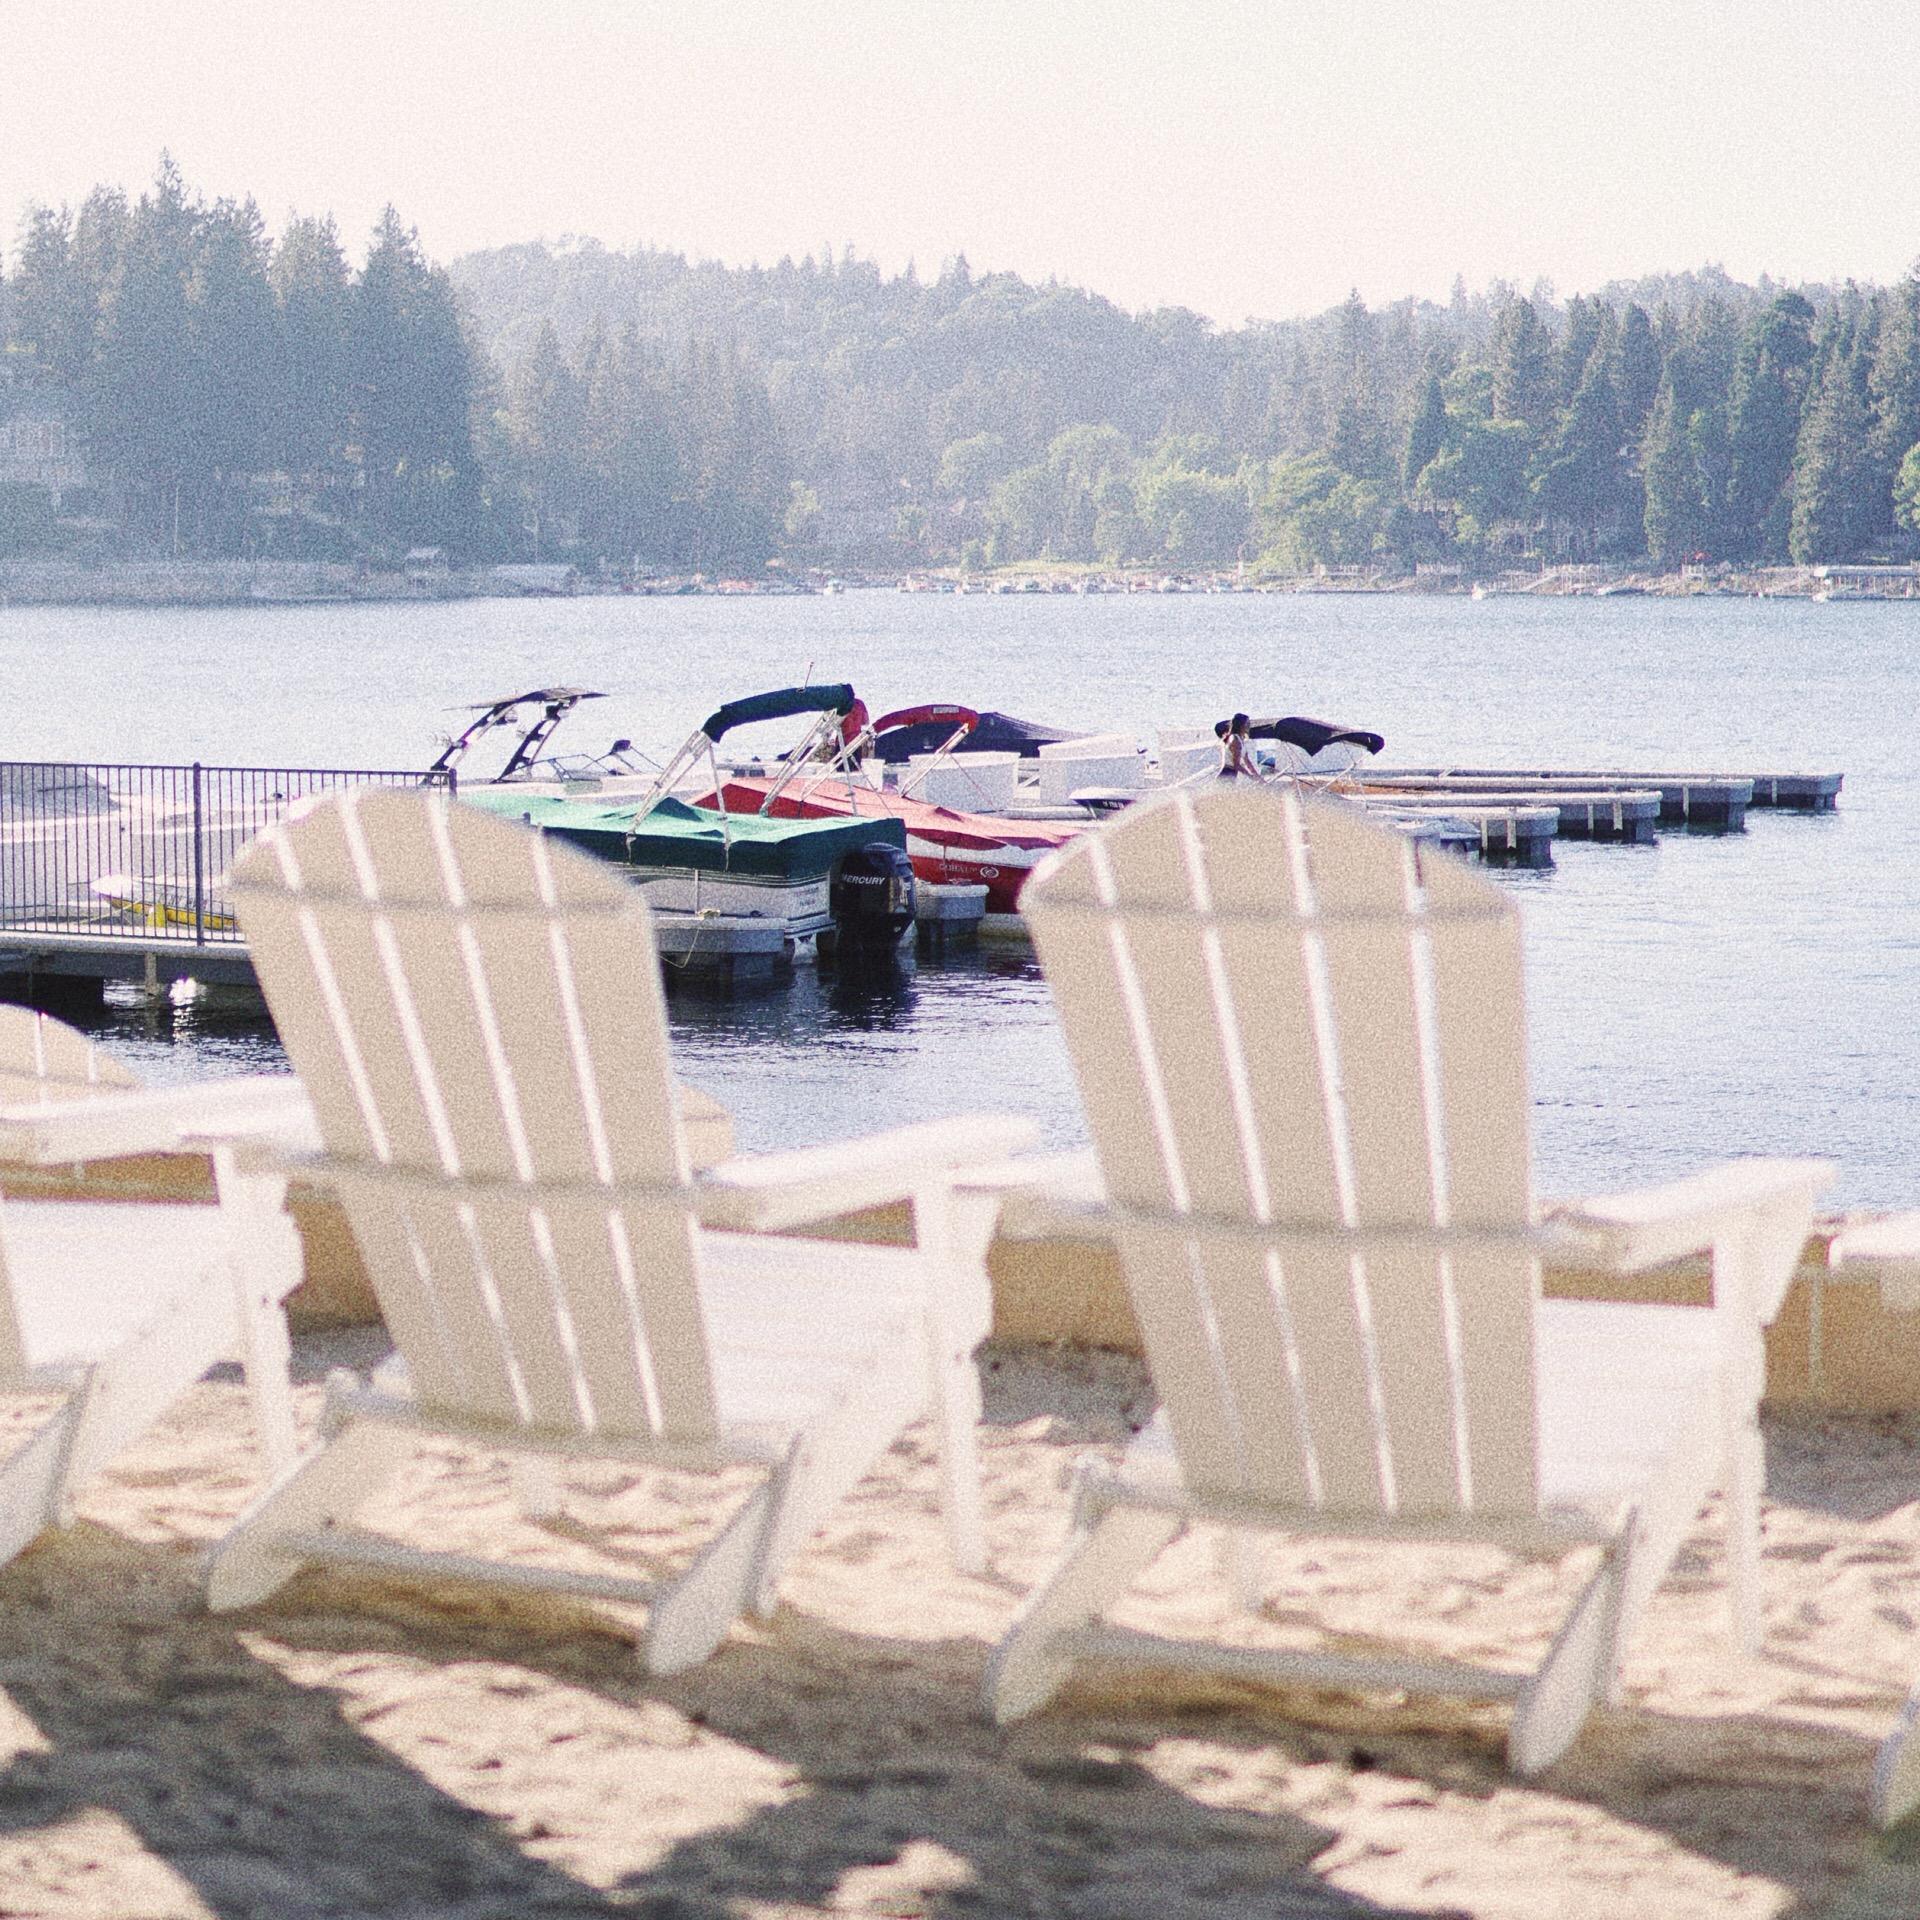 Lake Arrowhead Resort & Spa, Autograph Collection